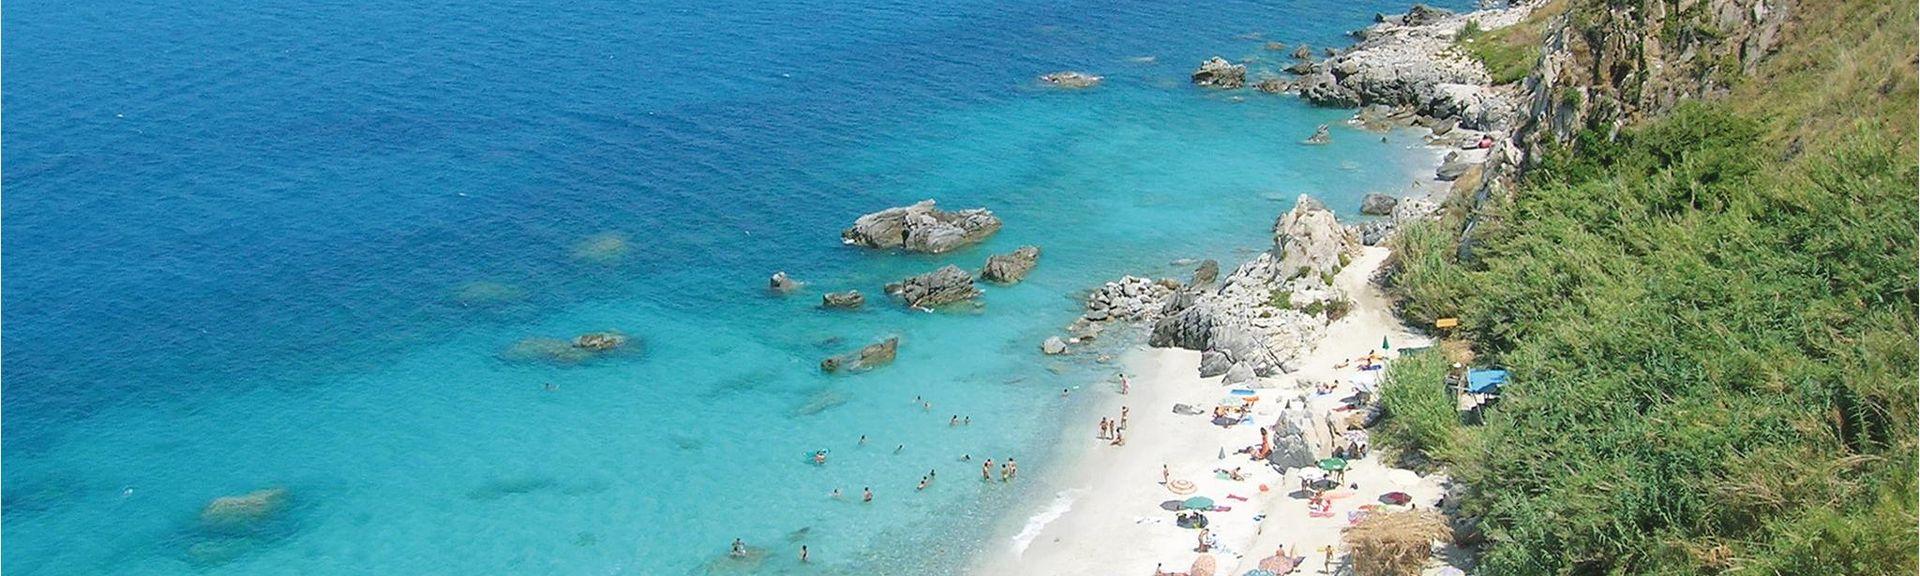 San Ferdinando, Calábria, Itália